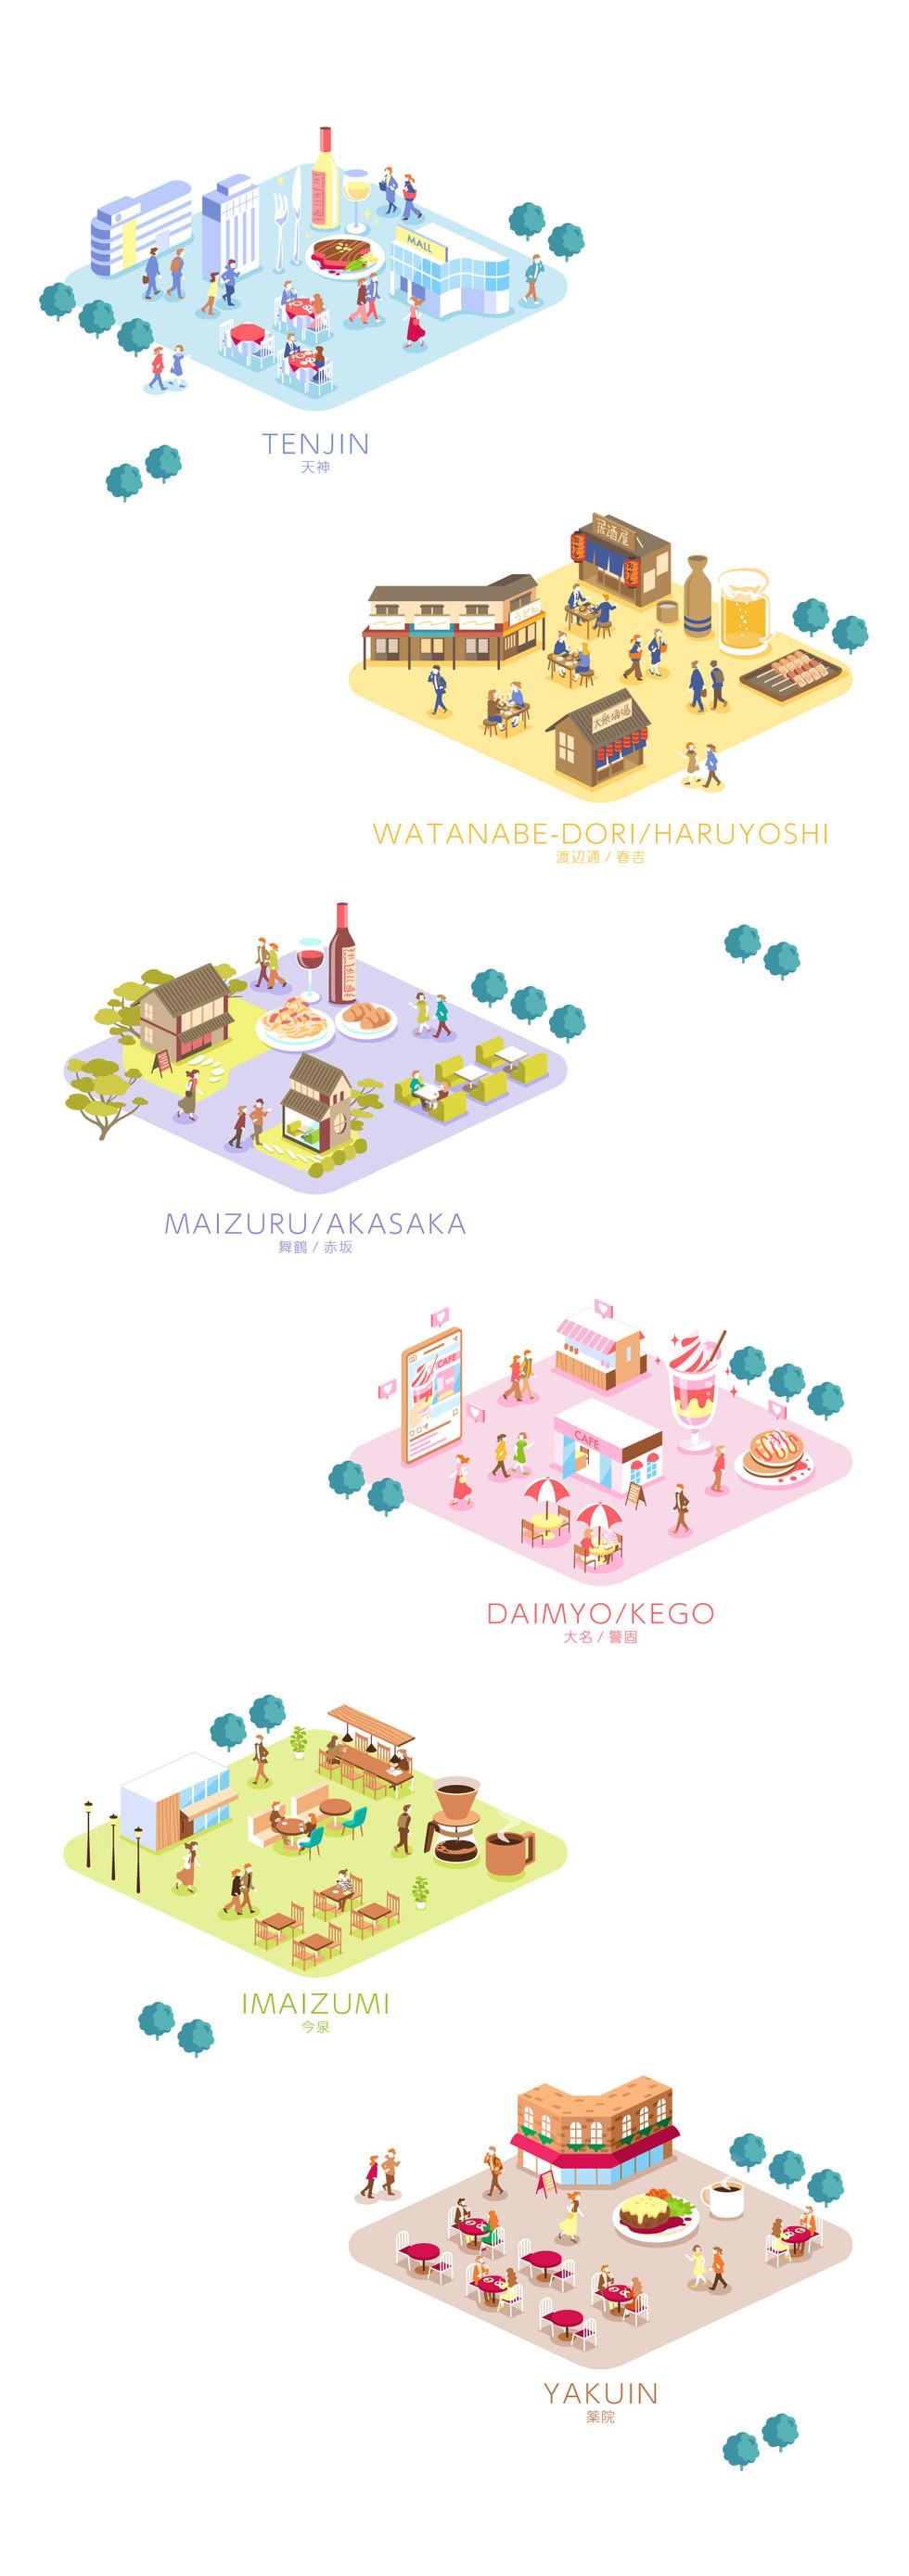 webtenjin_map_2.jpg